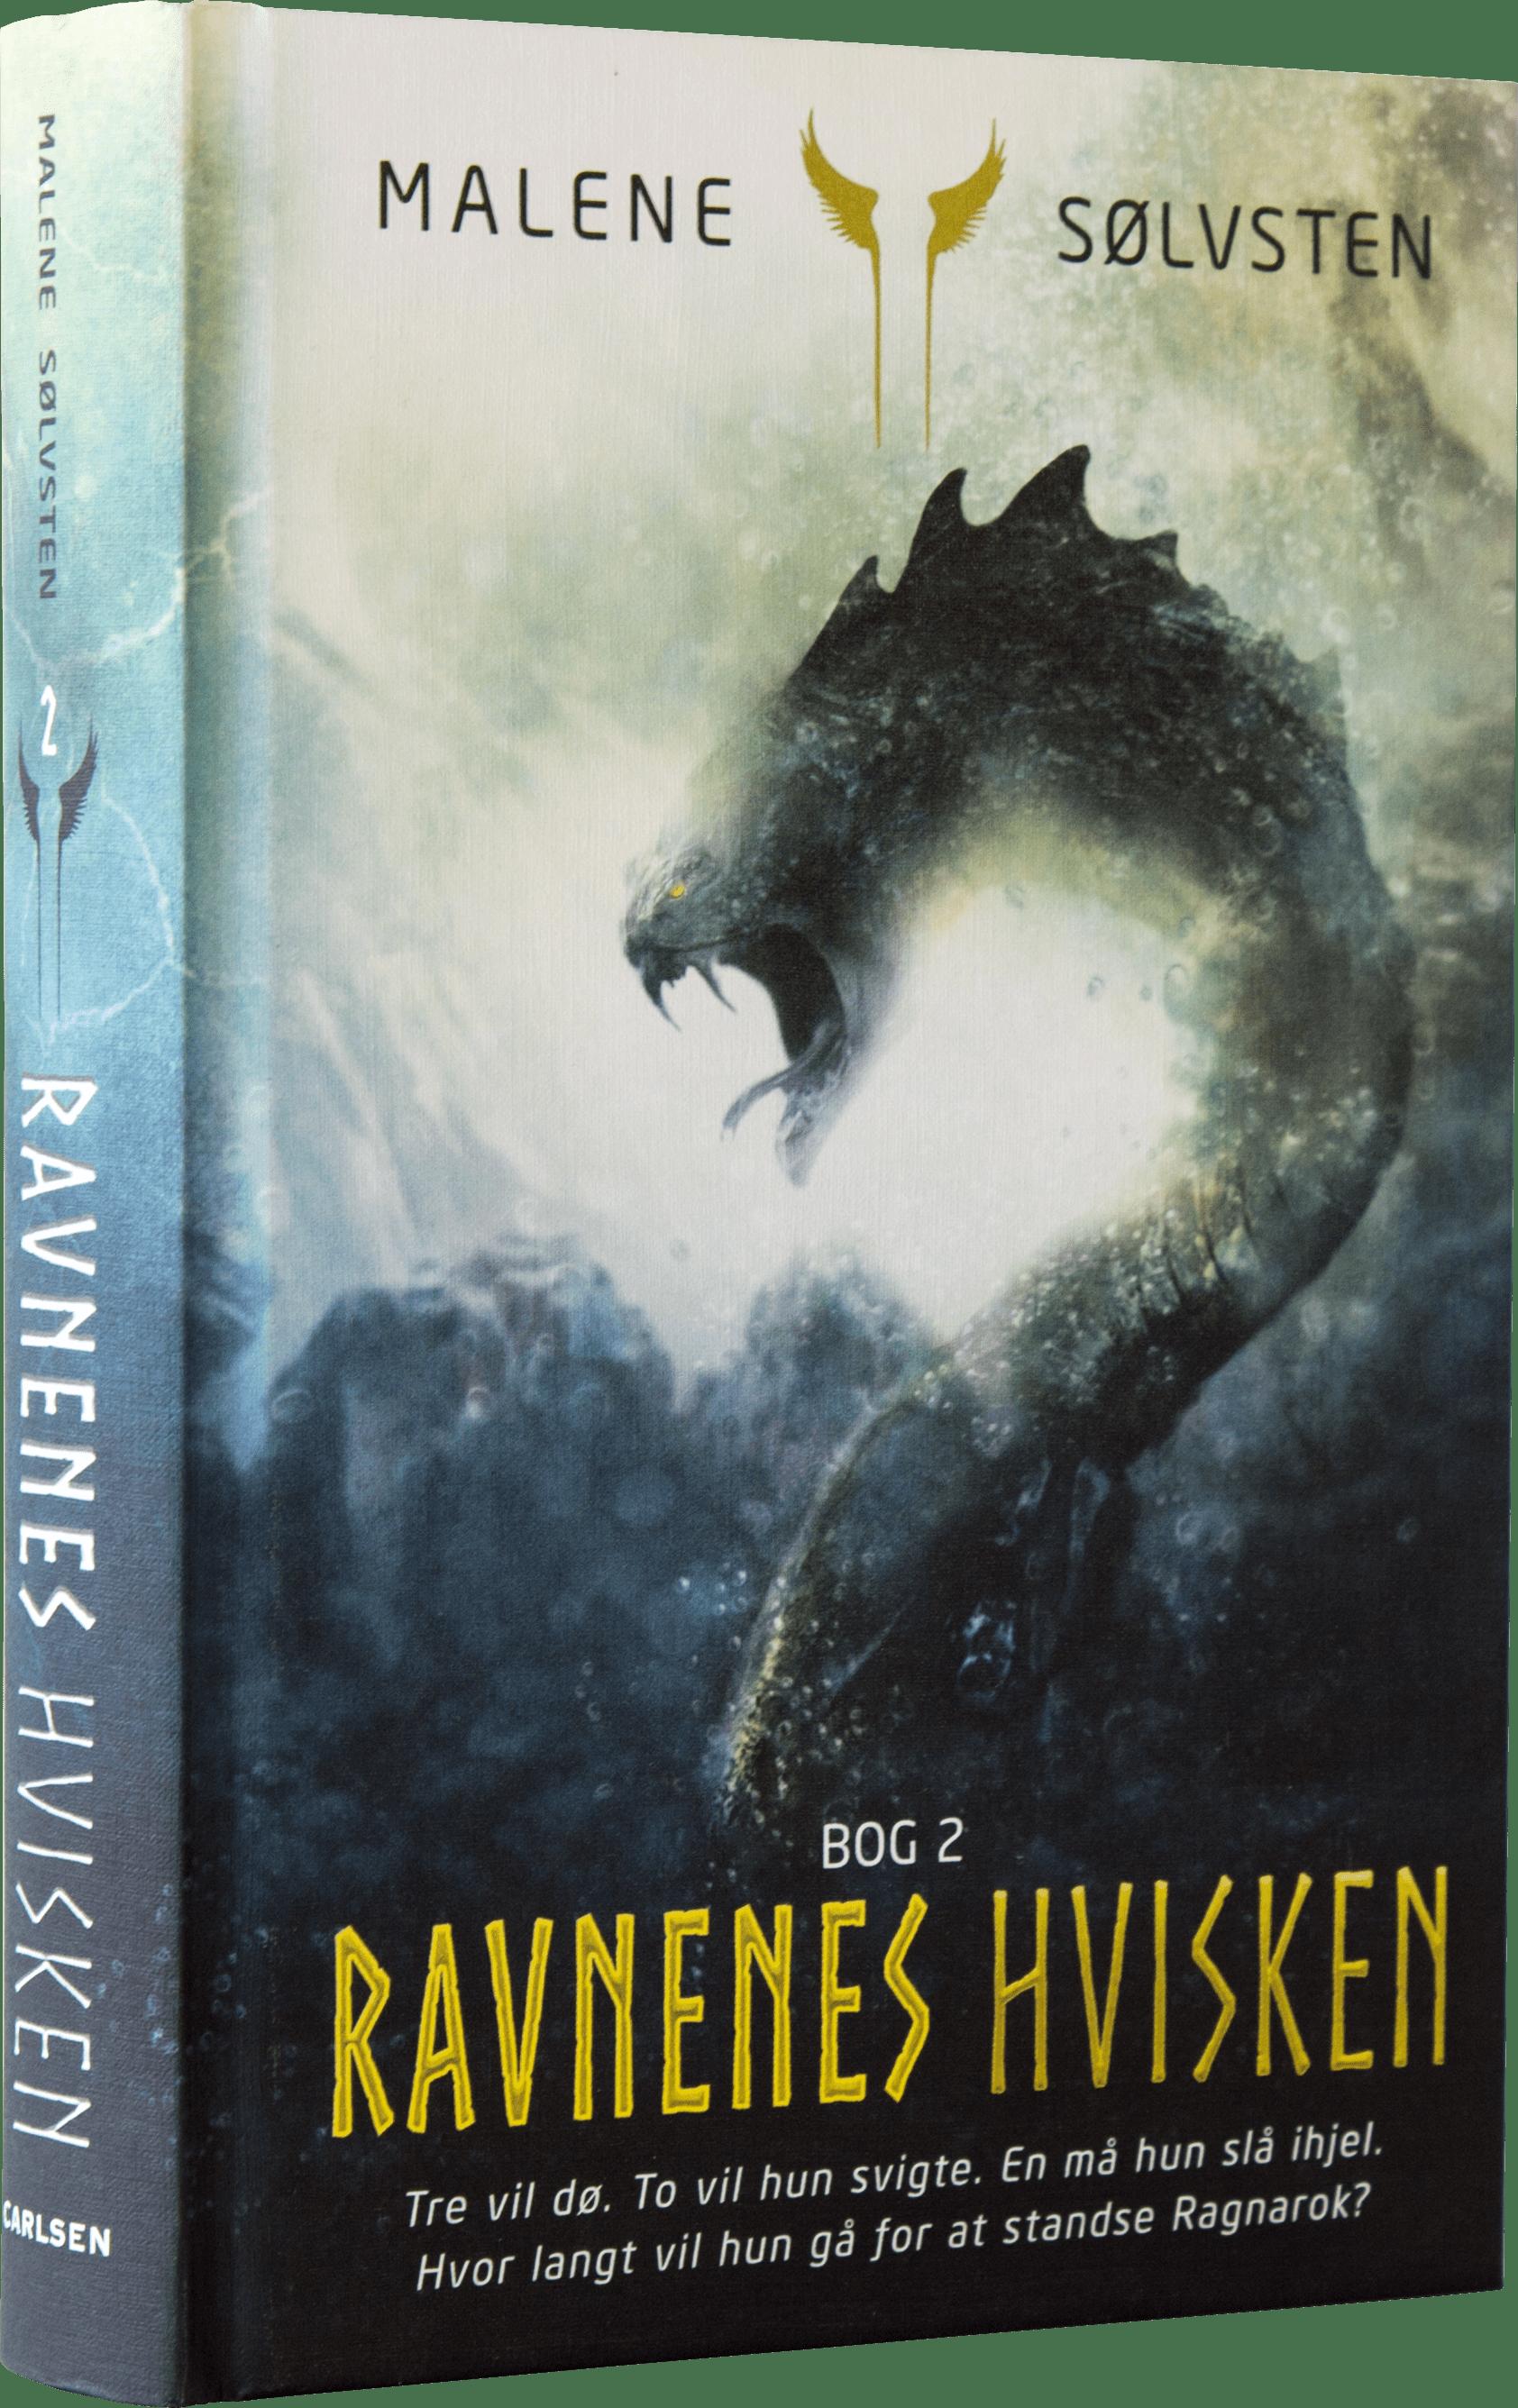 Ravnenes hvisken, Malene Sølvsten, fantasy, fantasy-bøger, ravnenes hvisken 2